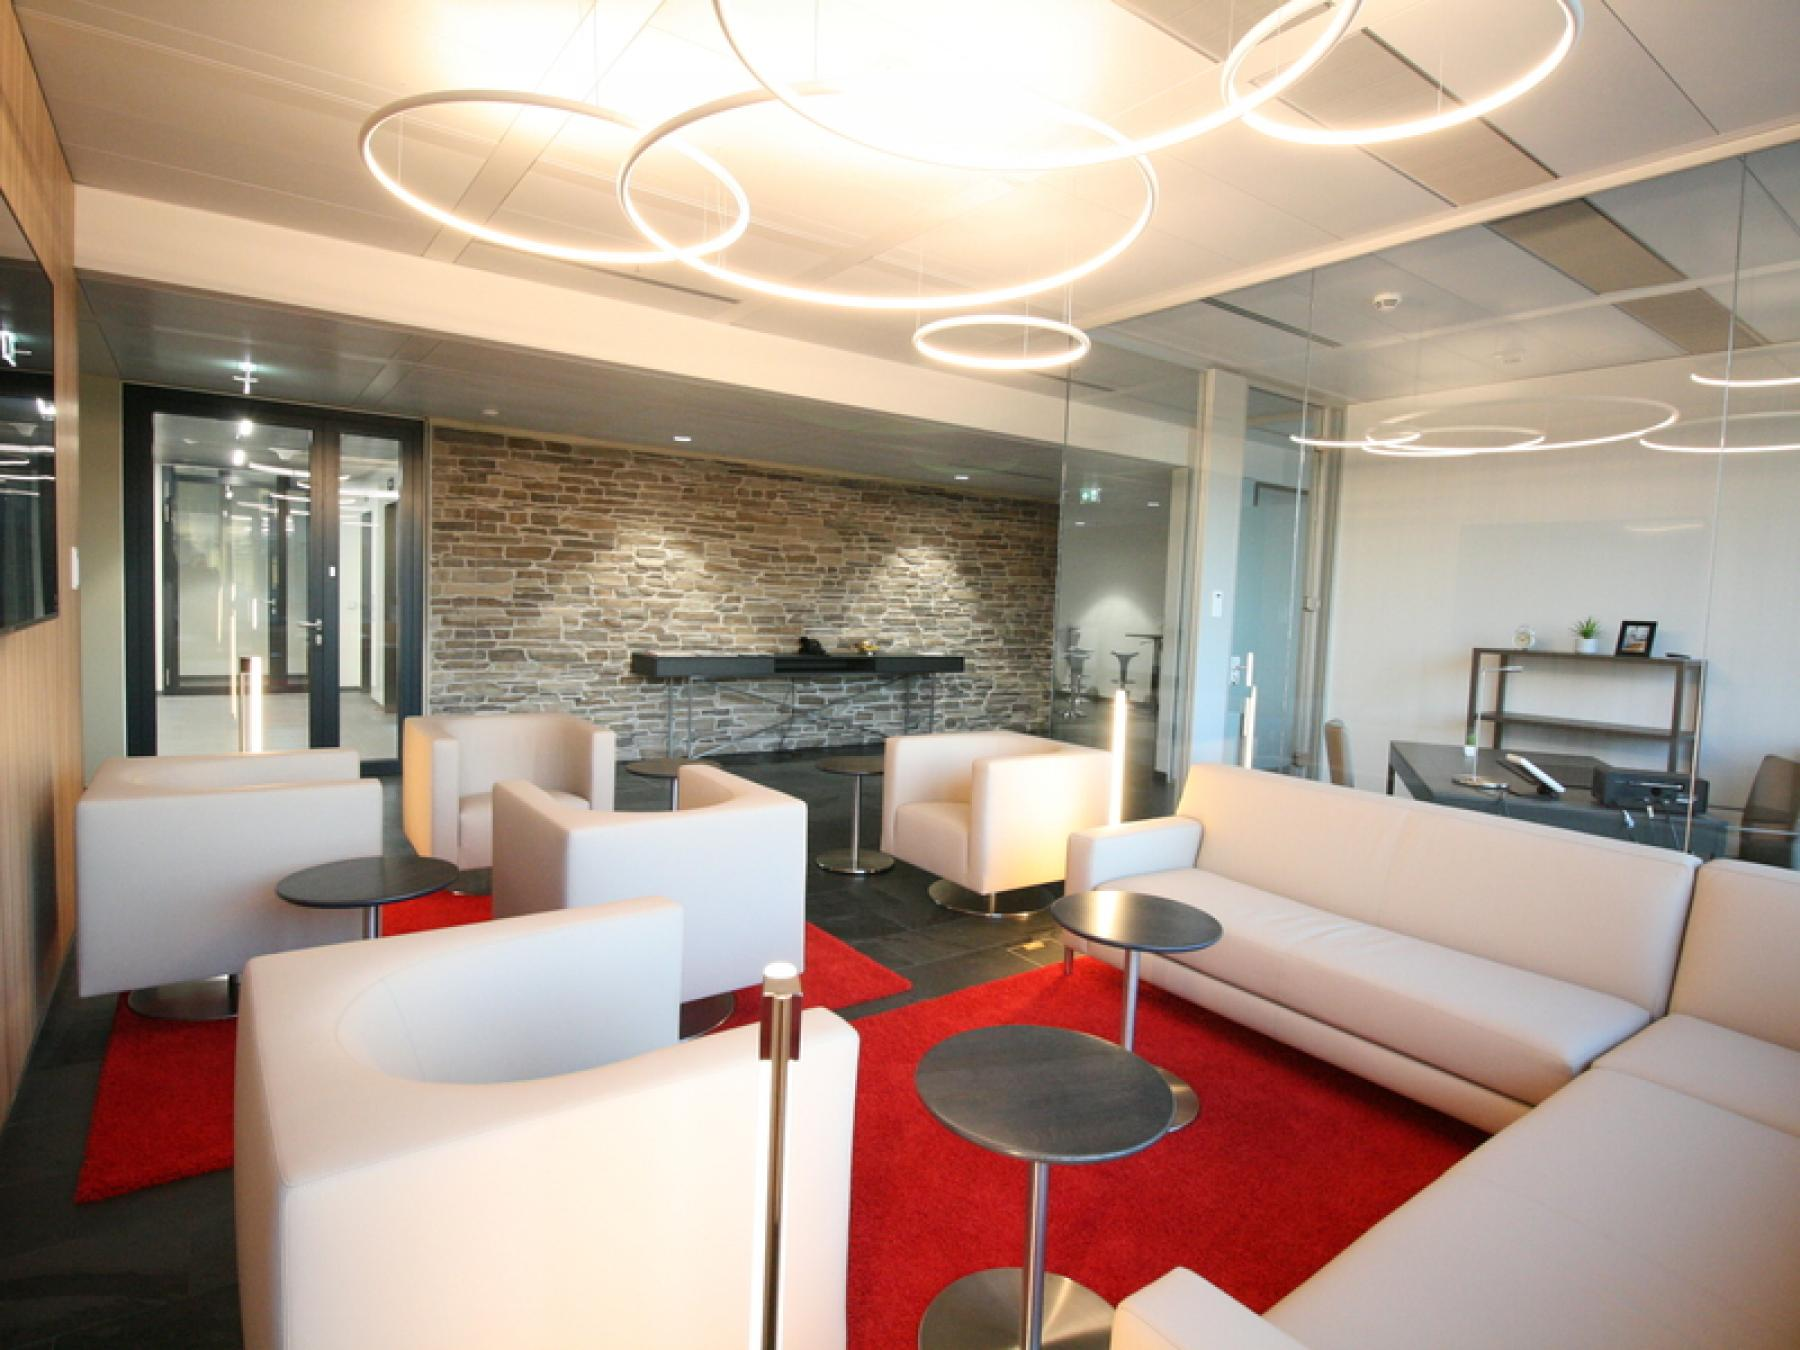 Moderne Business Lounge im Bürogebäude in Wien